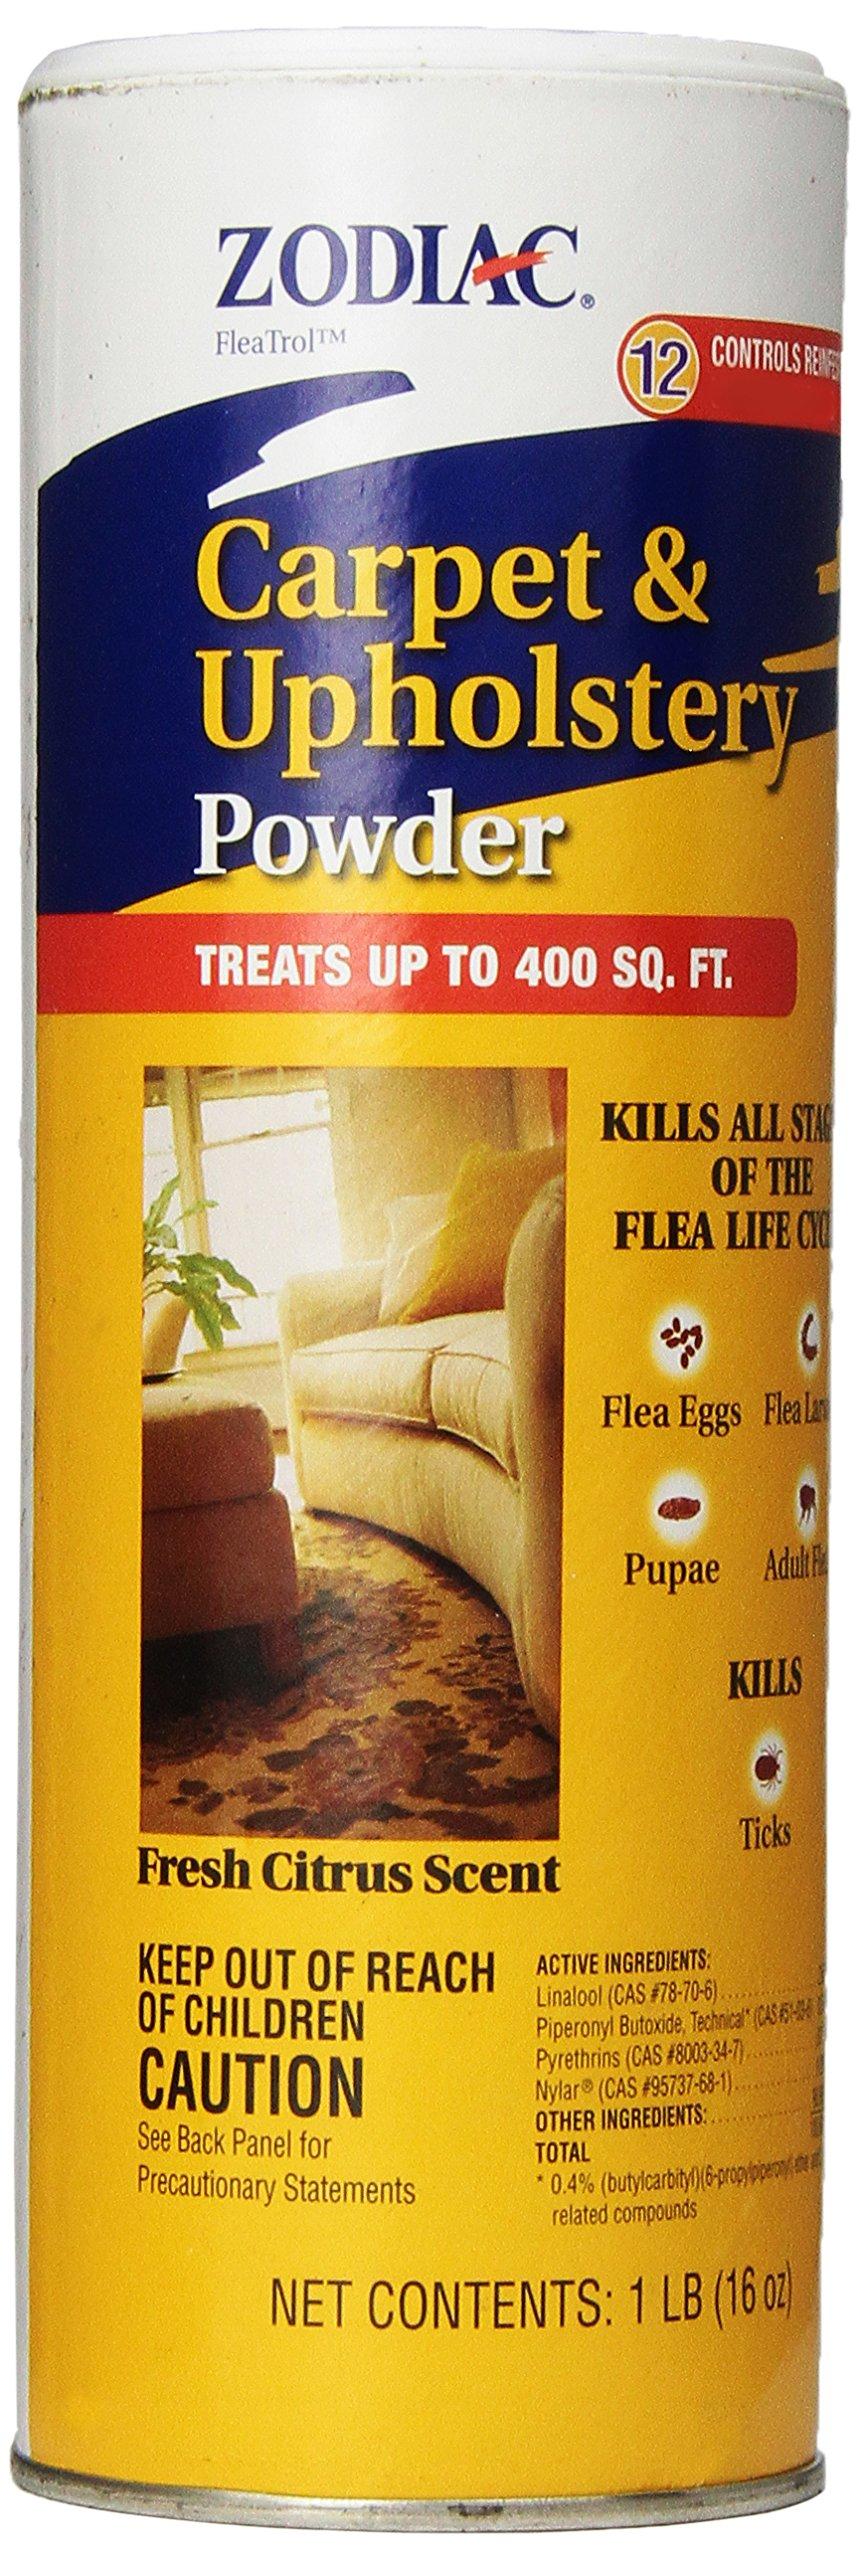 Zodiac Carpet & Upholstery Powder, 16-ounce by Zodiac